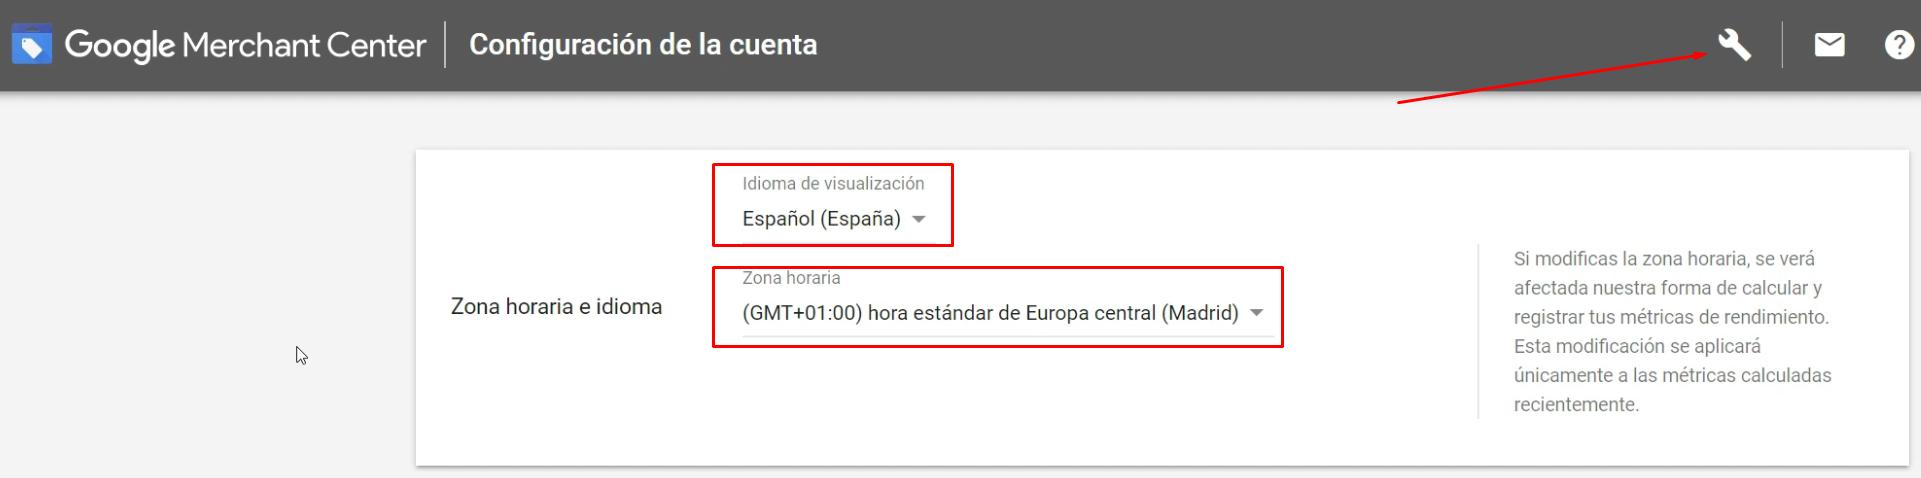 Interfaz Google Merchant Center en español